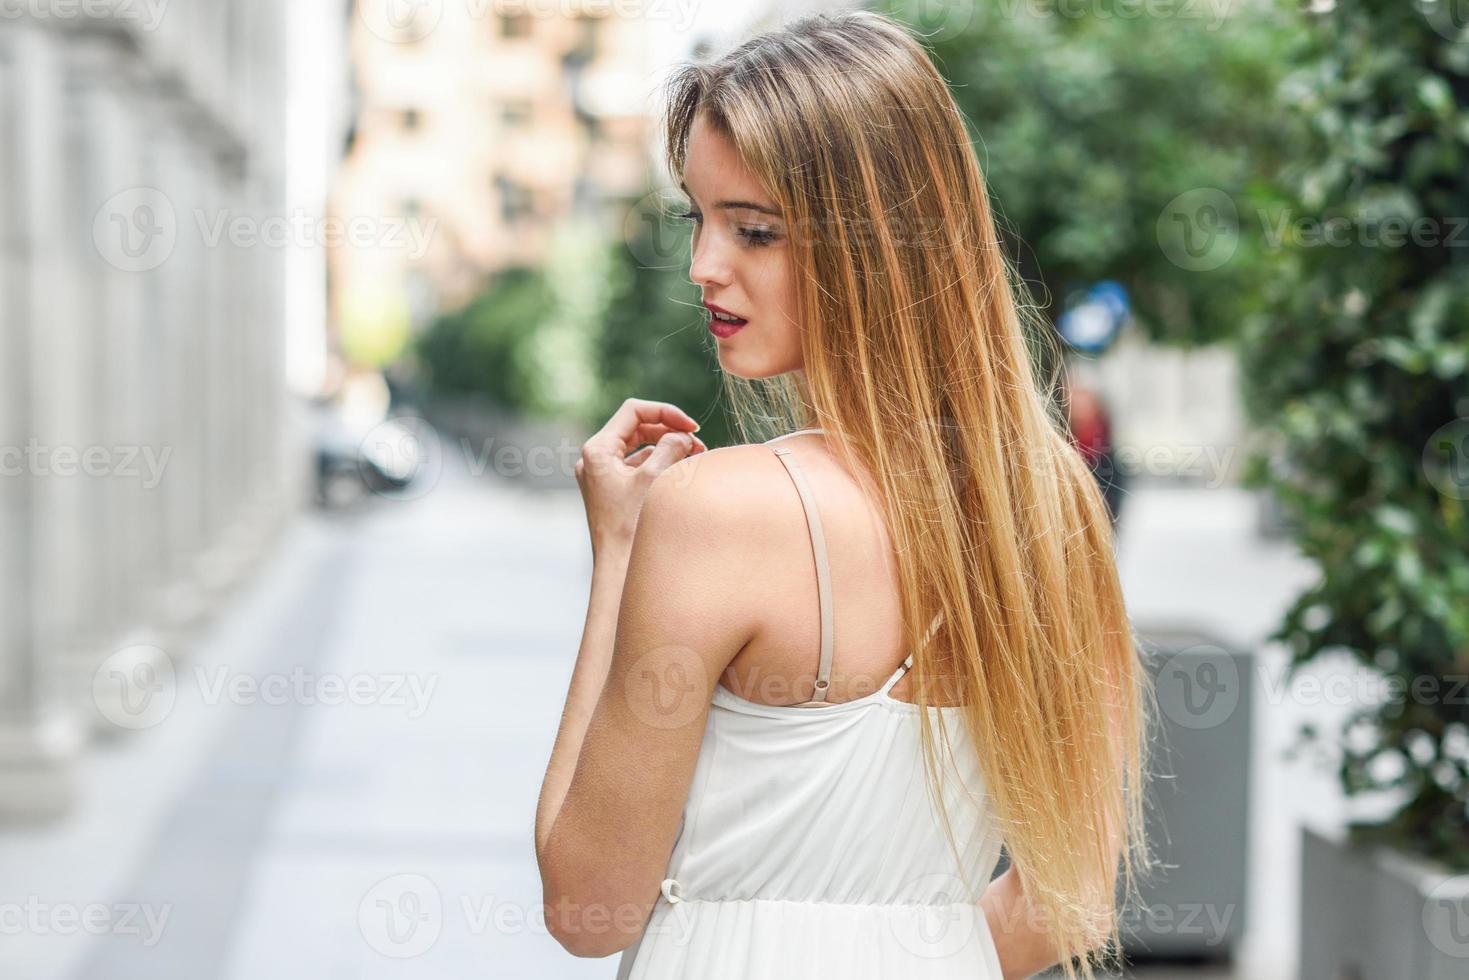 hermosa chica rubia en fondo urbano foto